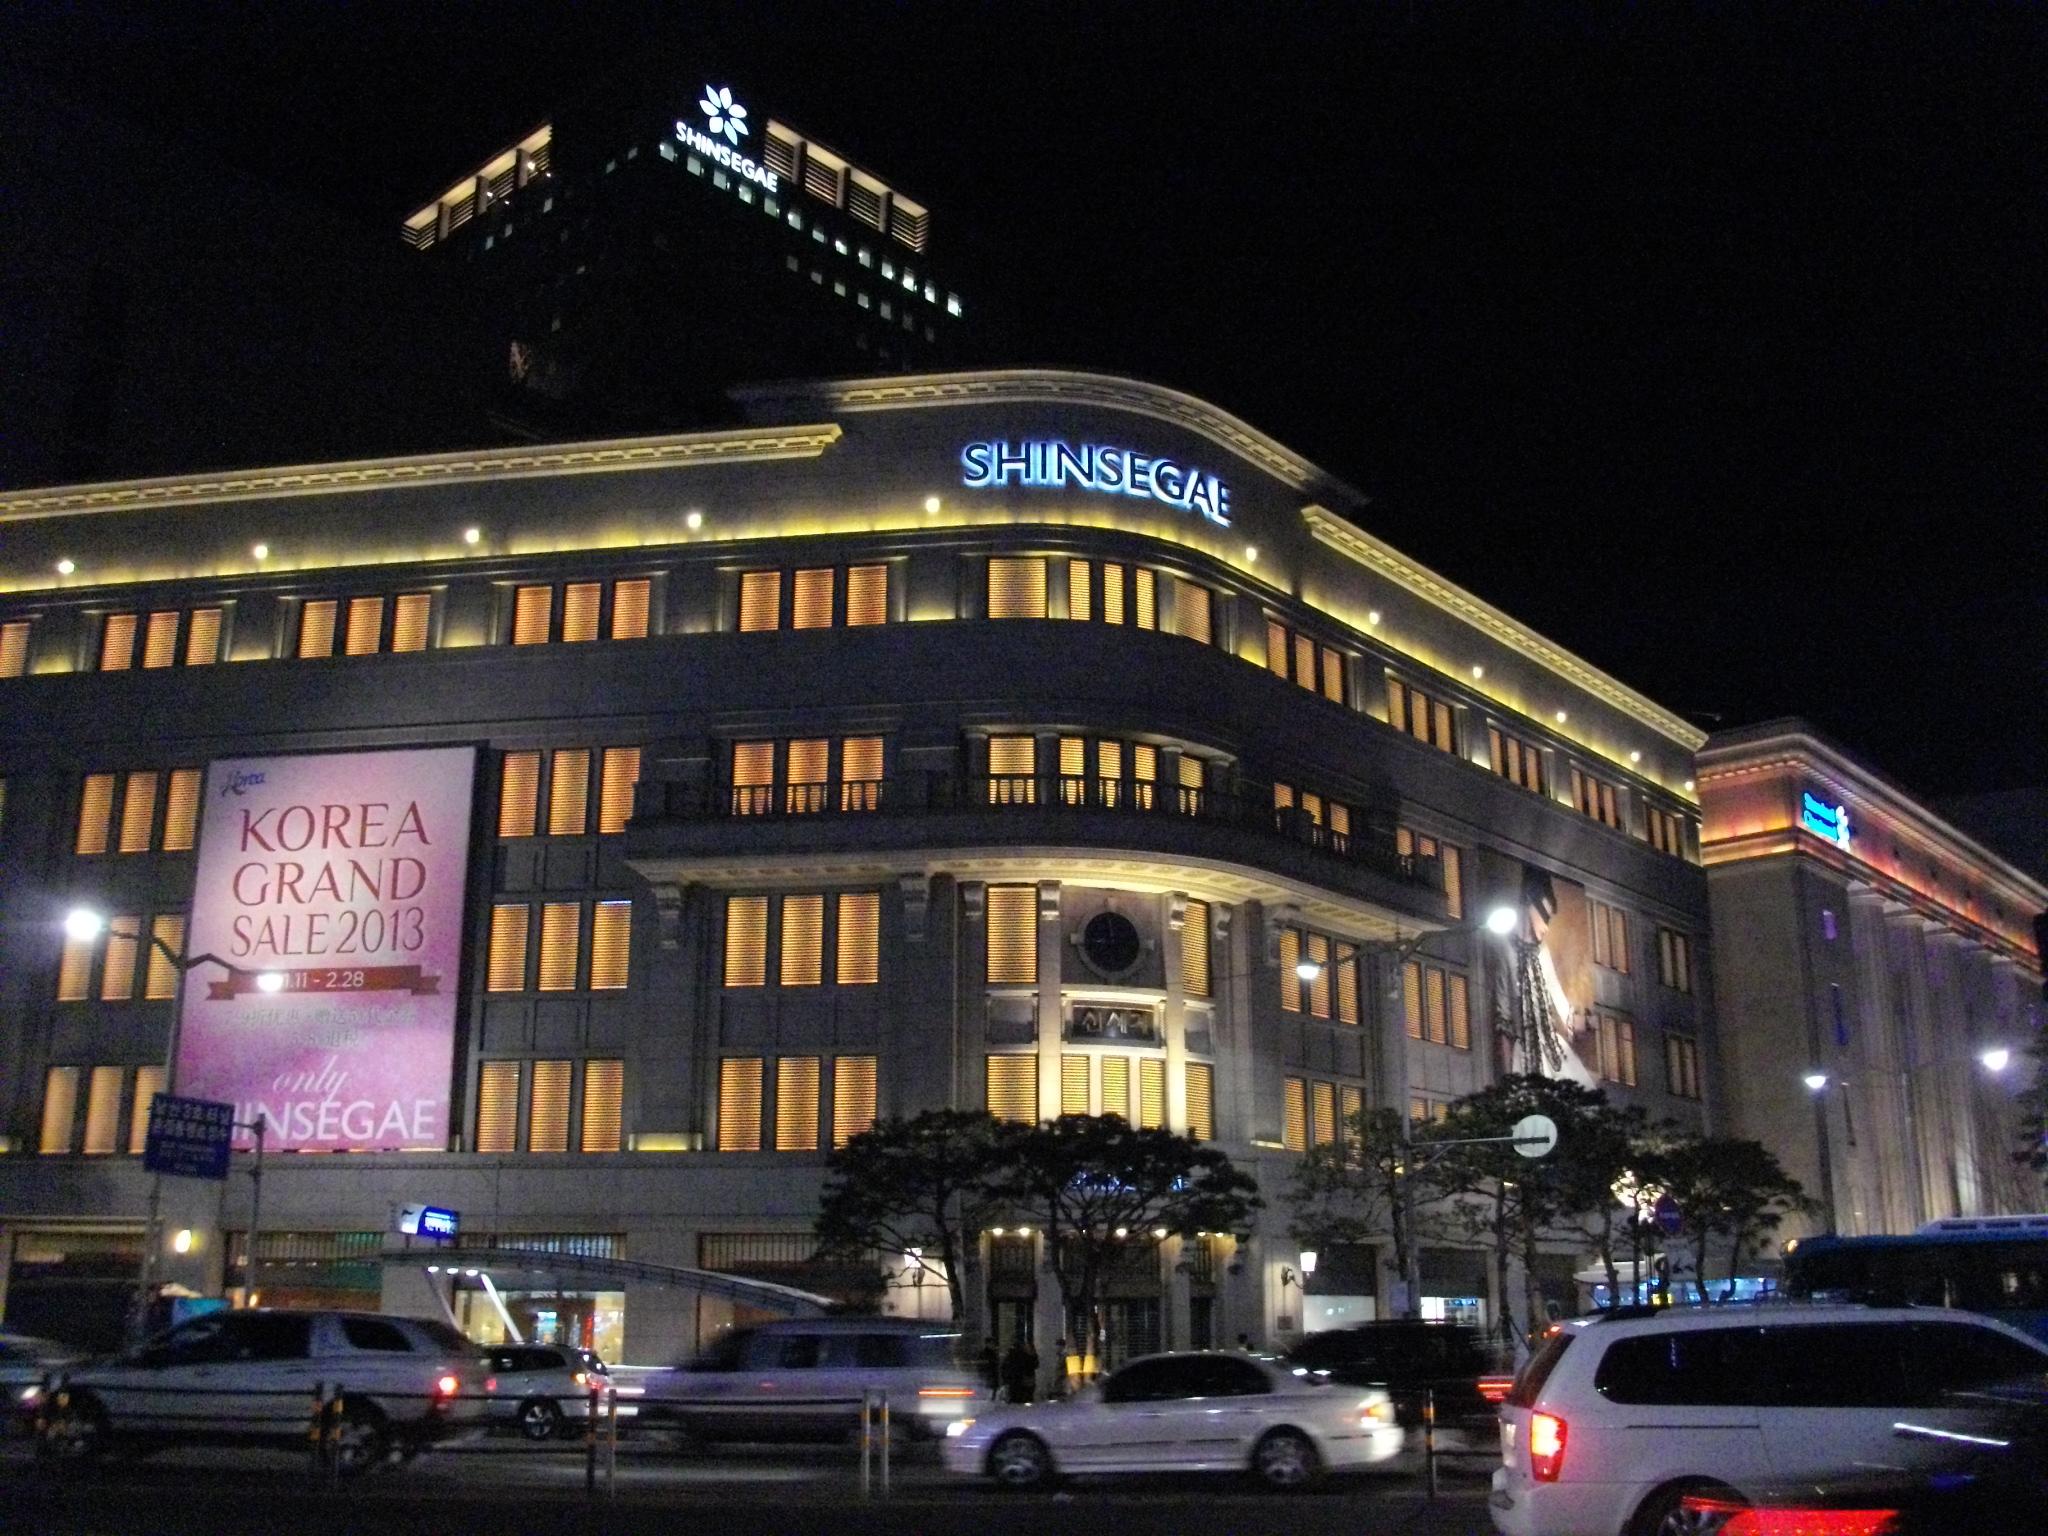 Description shinsegae department store main store at night 01 jpg